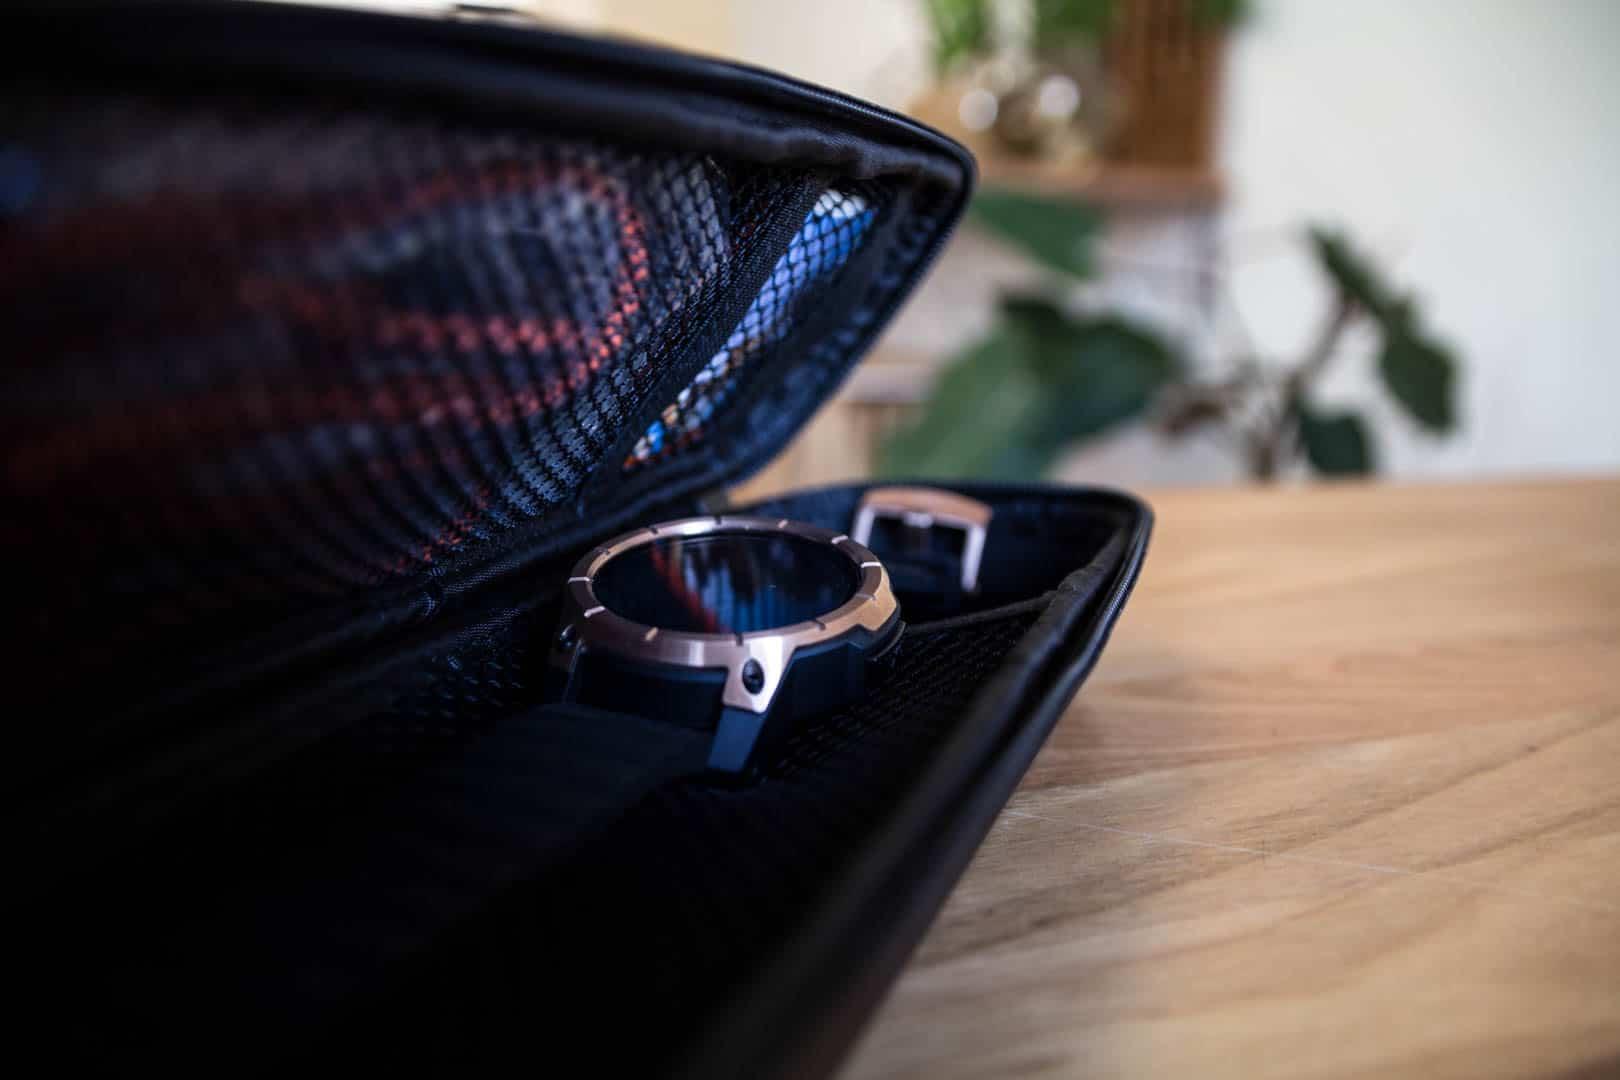 nixon smartwatch in the case